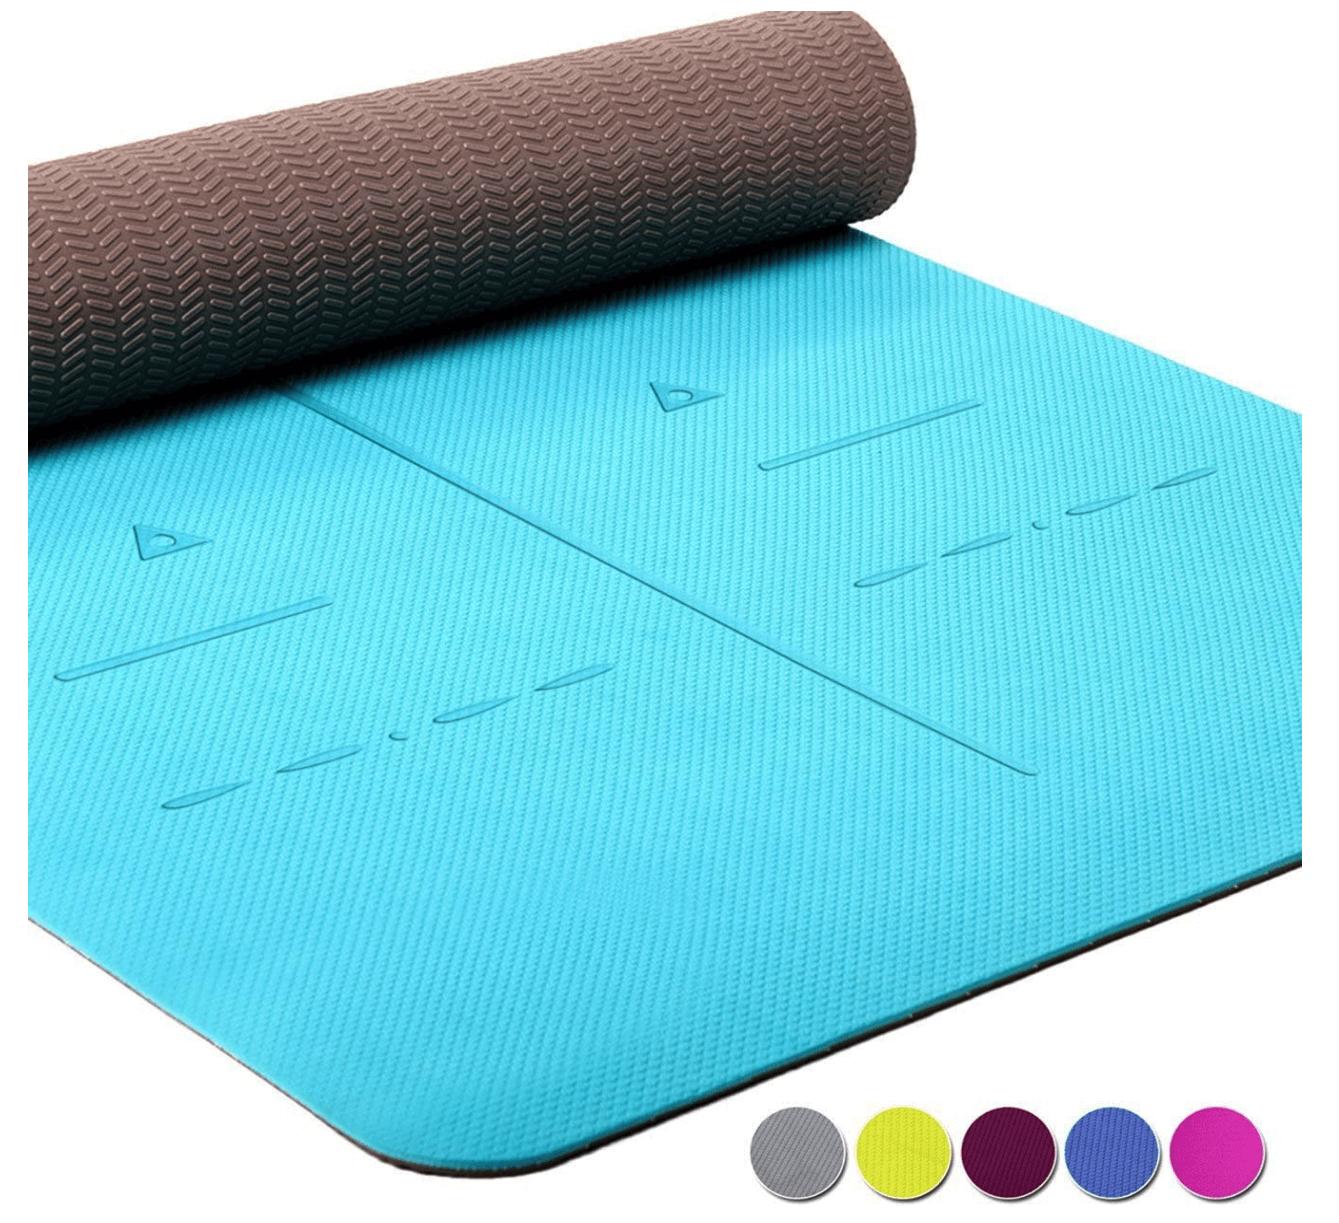 Heathyoga Eco-Friendly Non Slip Yoga Mat